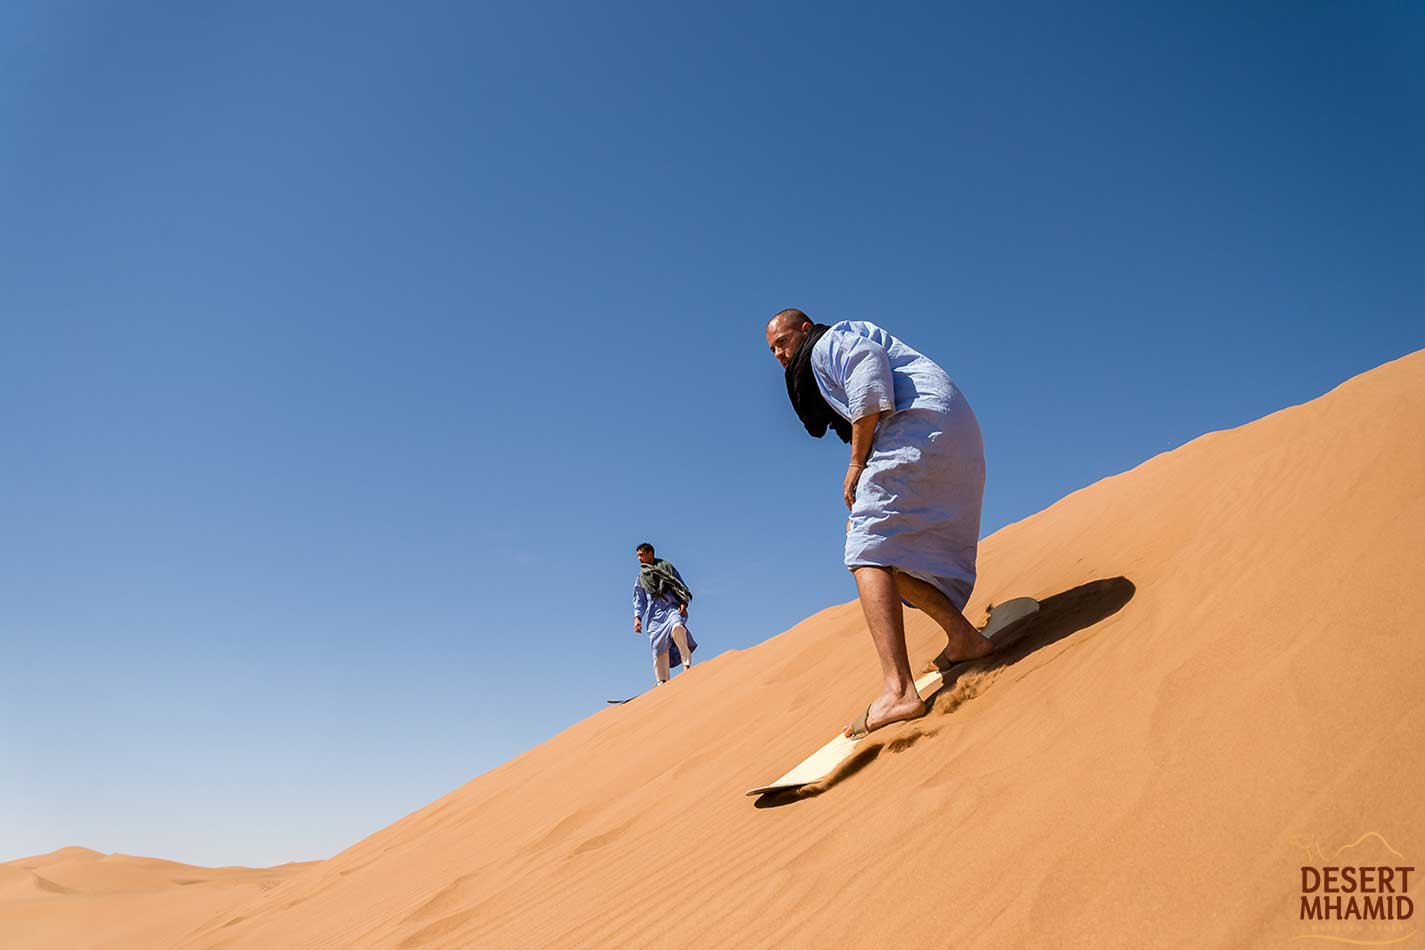 Desert trip from Mhamid